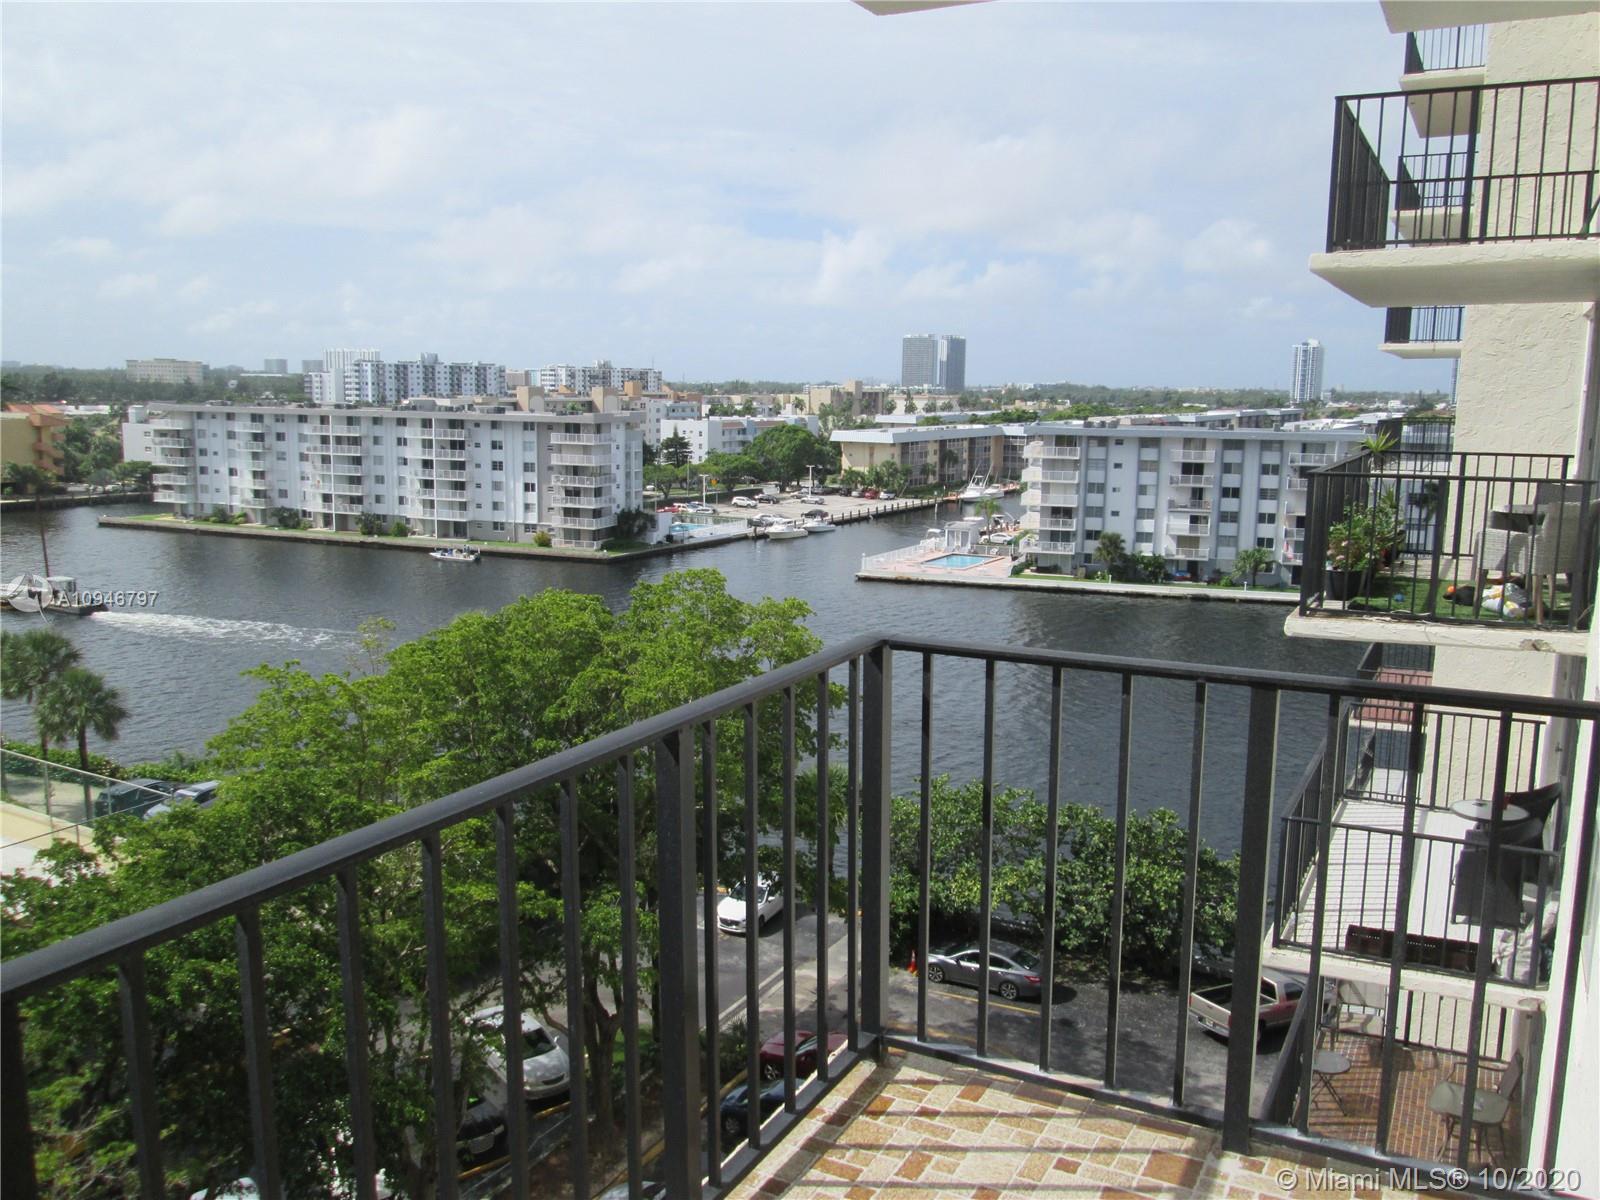 Winston Tower 500 #806 - 301 174th St #806, Sunny Isles Beach, FL 33160